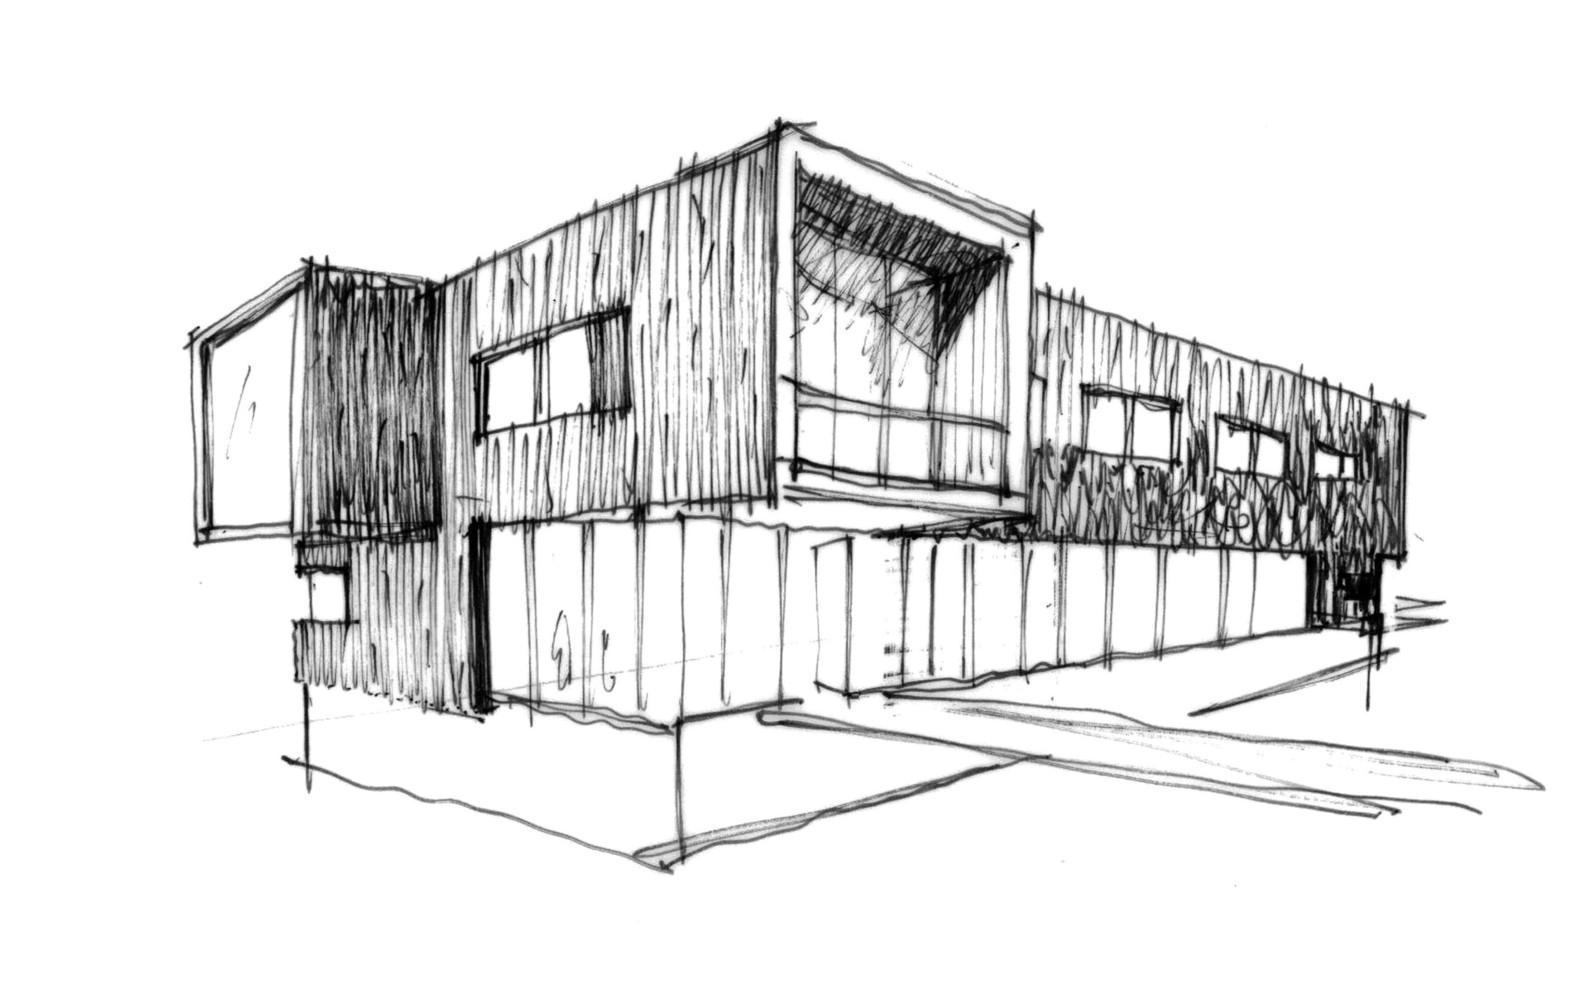 Gallery of Floating Office for Waternet / Attika Architekten - 14